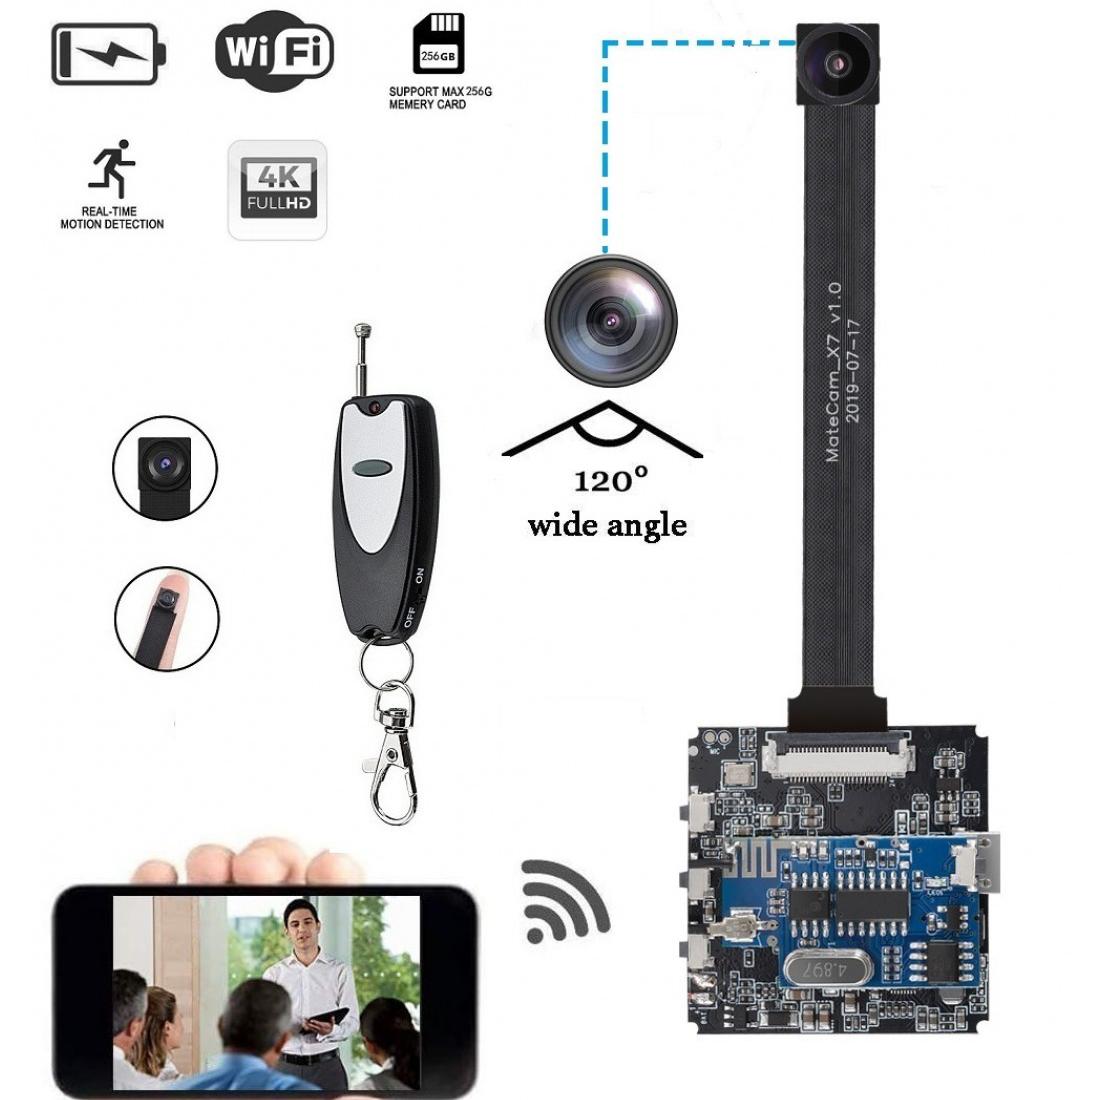 WholesalePEN SPY CAMERA WIFI- 4K Ultra HD DIY Wireless Camera 120 Degree Mini DVR Motion Detection Nanny Cam Security System APP Control Action Camera up to 256GB – MATECAM